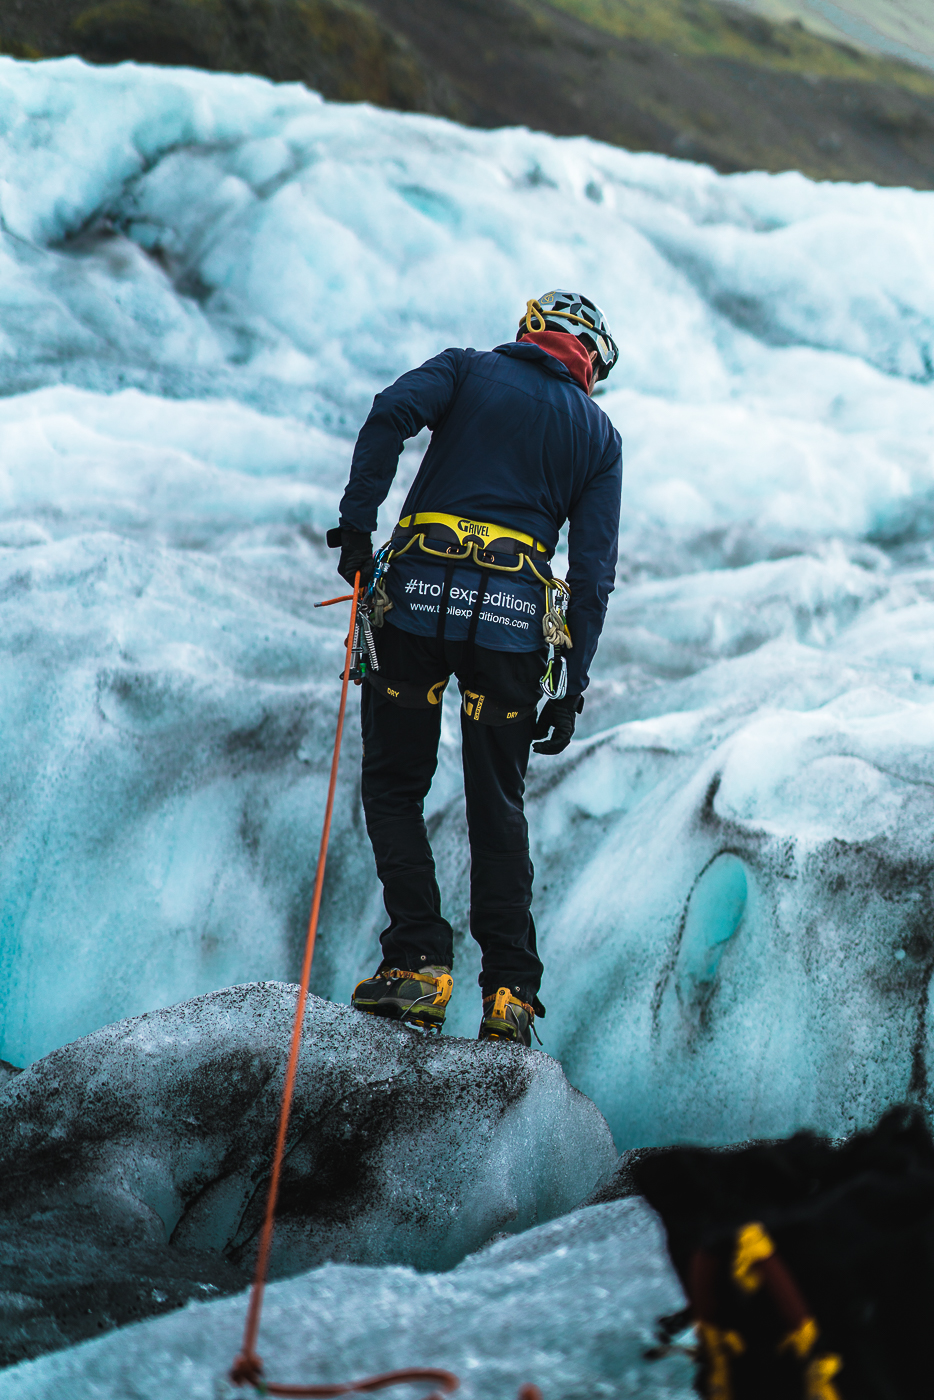 gabornagy_photography_iceland_glacier13.jpg